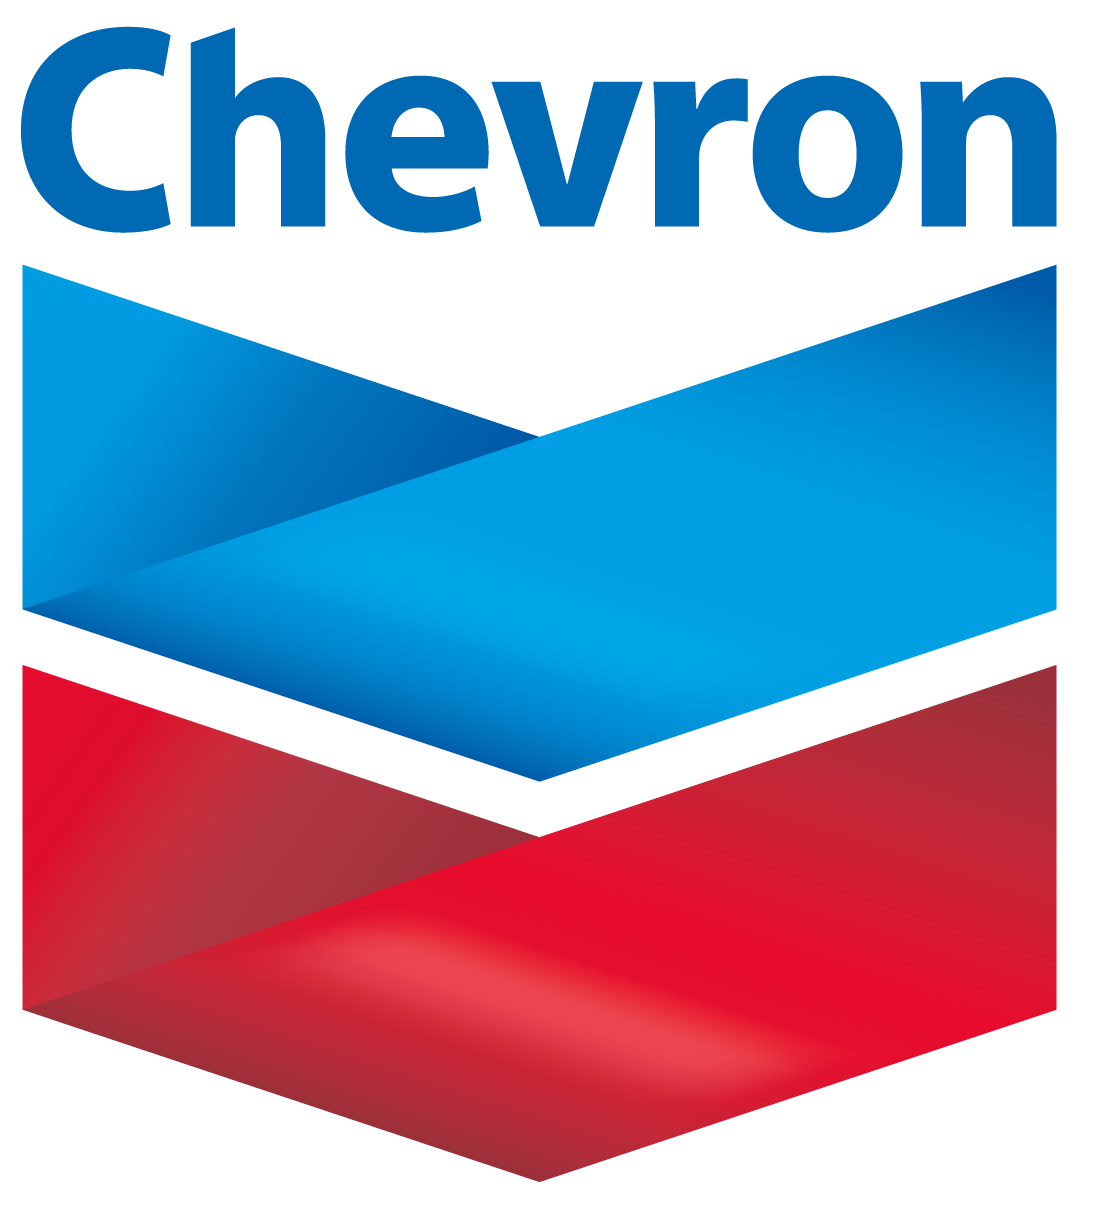 chevron logo 2 - Chevron Logo